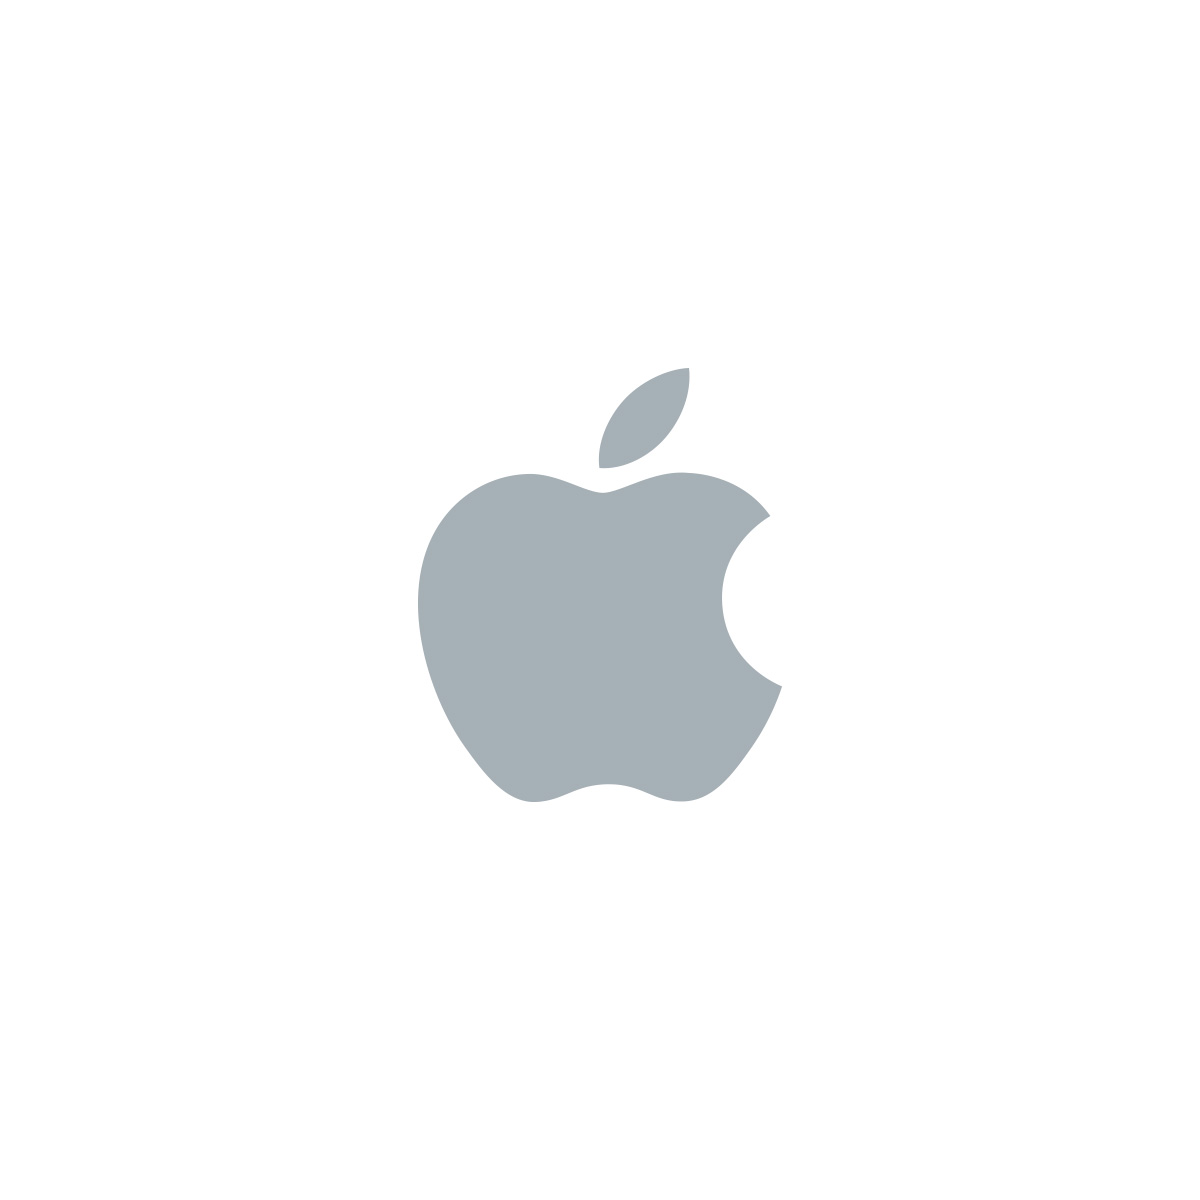 iCloud - iPhone、iPad、Macを探す - Apple(日本)